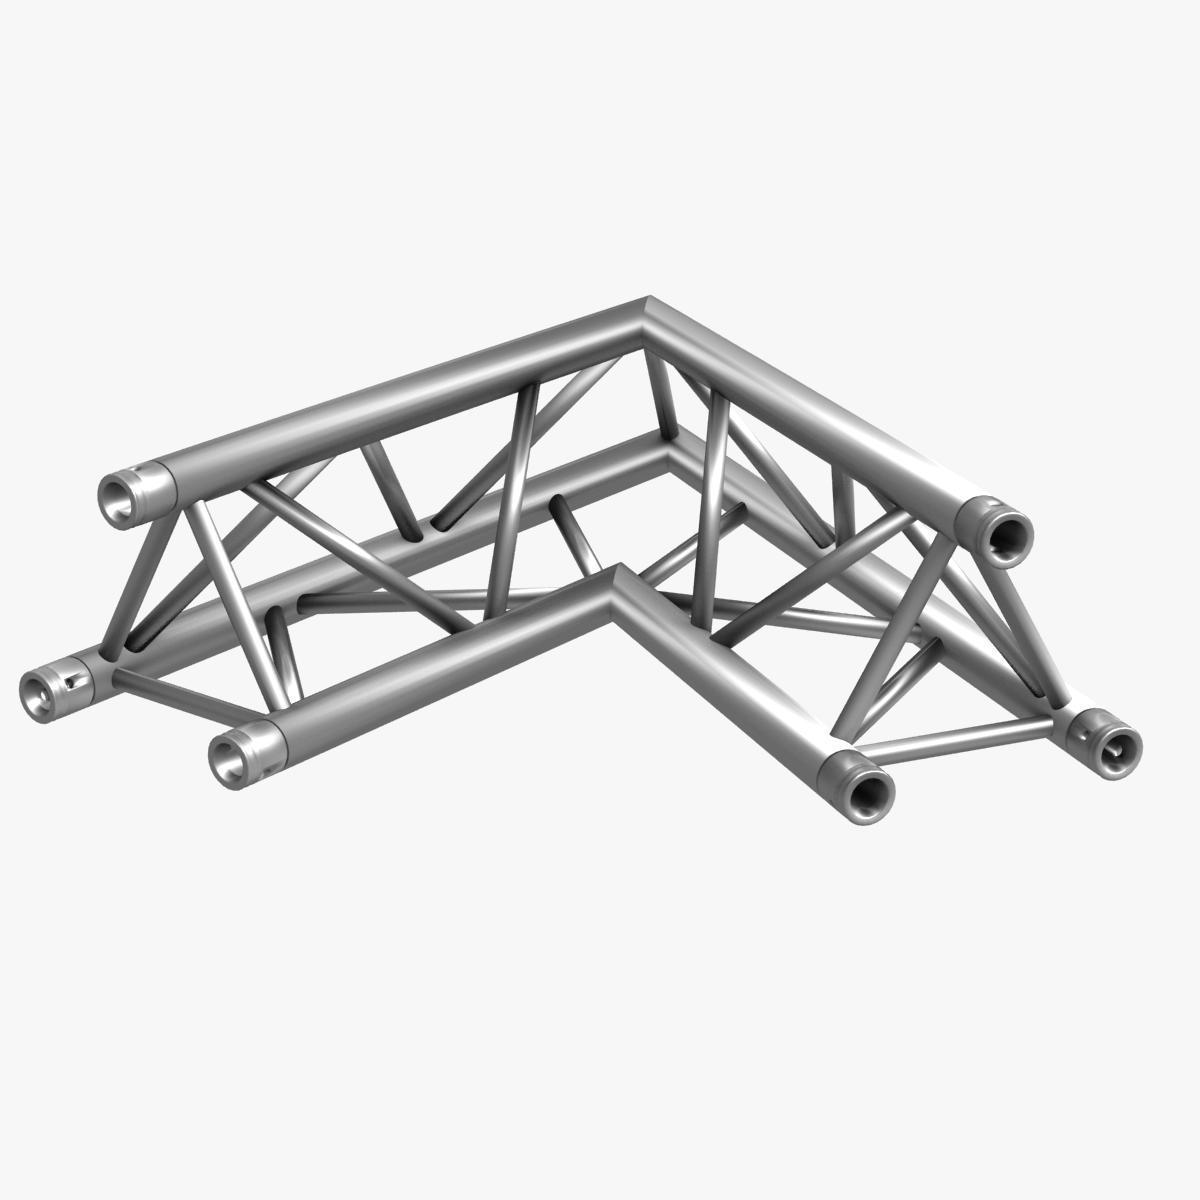 triangular trusses (collection 55 modular pieces) 3d model 3ds max dxf fbx c4d dae texture obj 216233